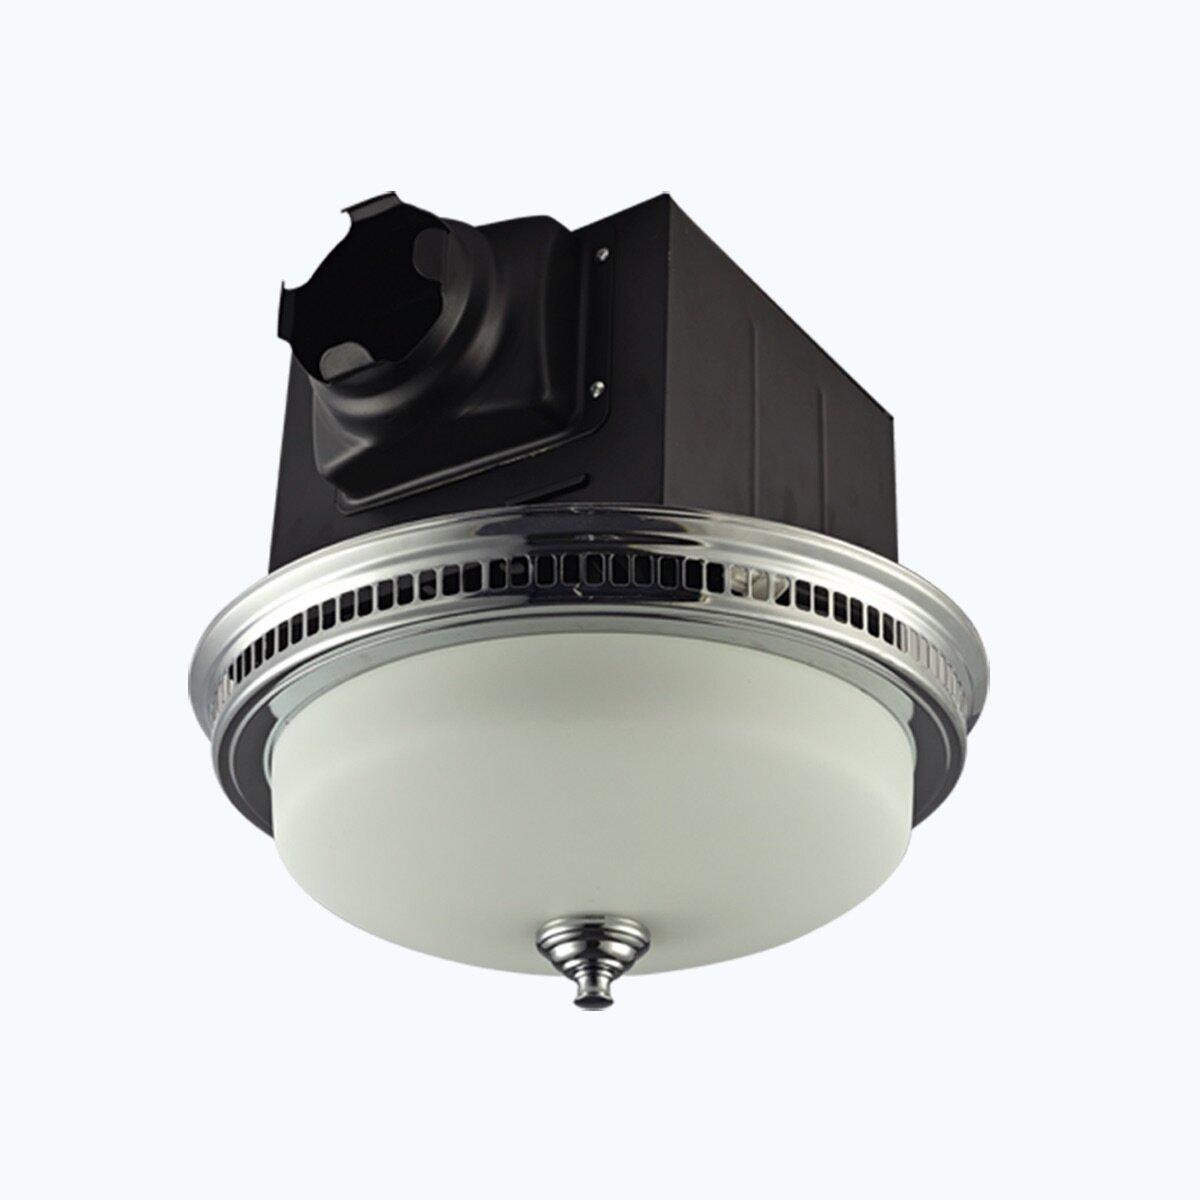 Drnd110crm 110 Cfm Bathroom Fan With Light